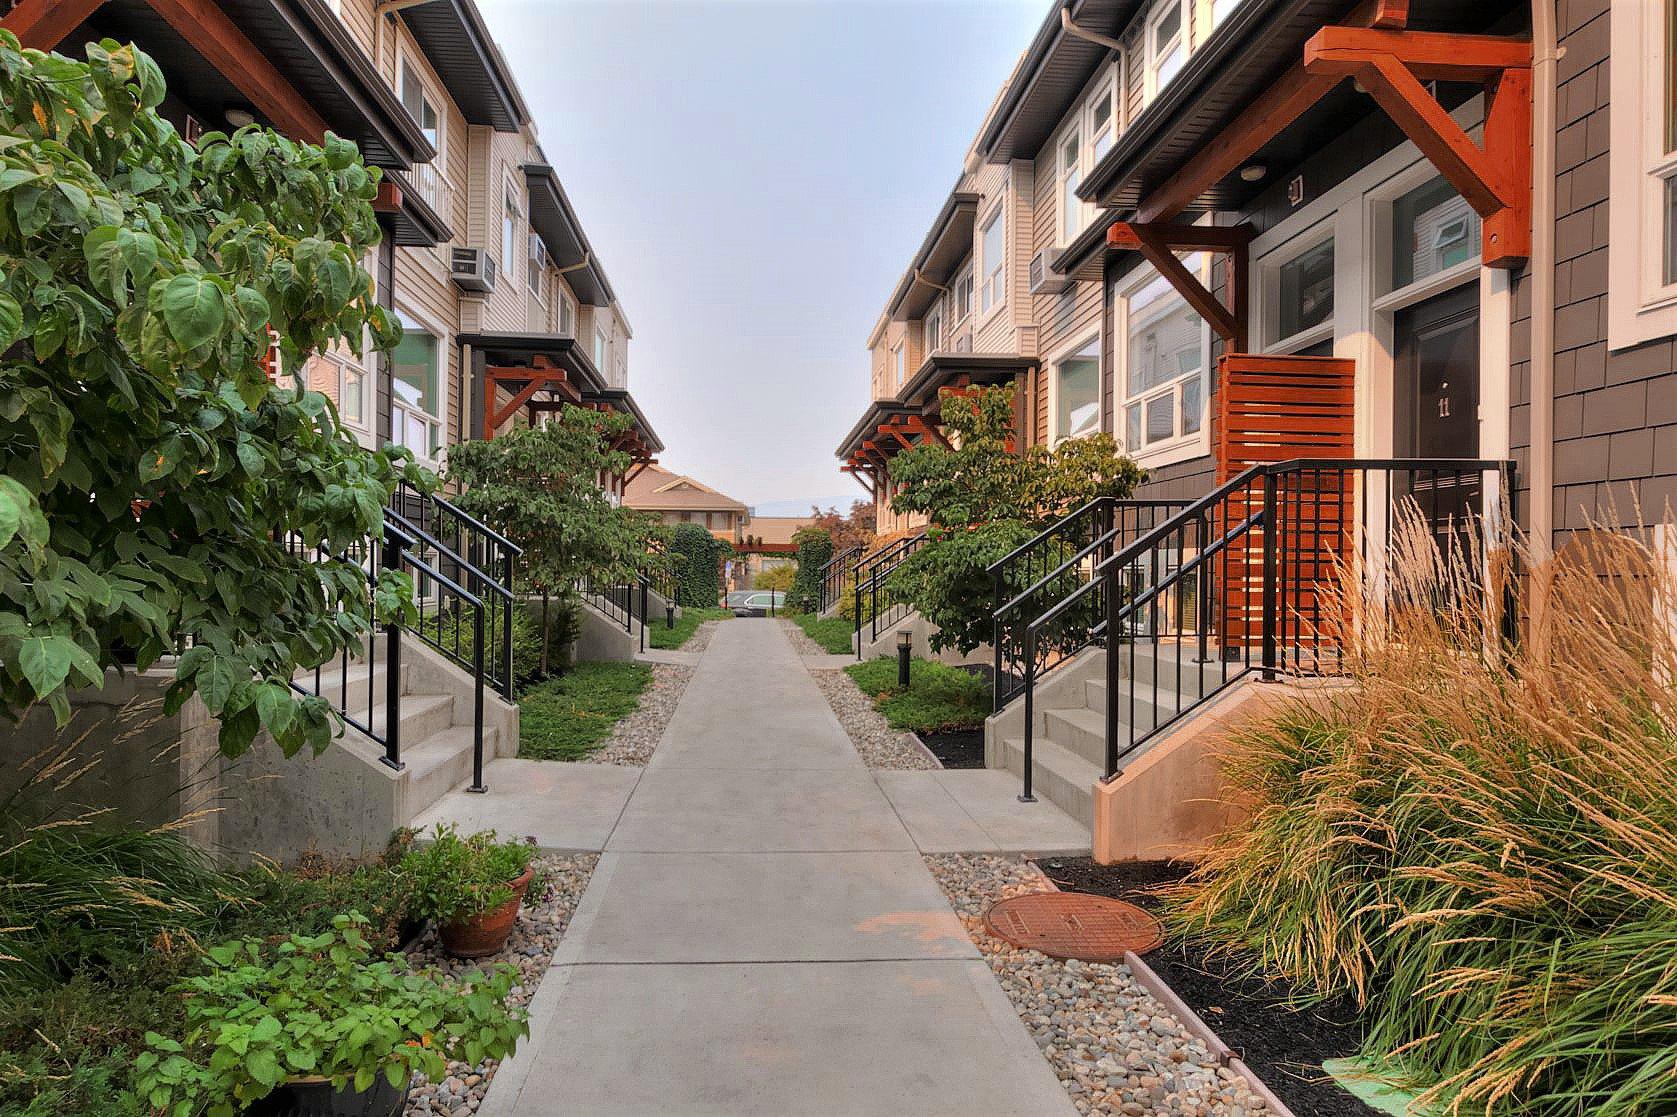 Main Photo: 3 1851 Ambrosi Road in Kelowna: springfield/Spall House for sale (Central Okanagan)  : MLS®# 10142616